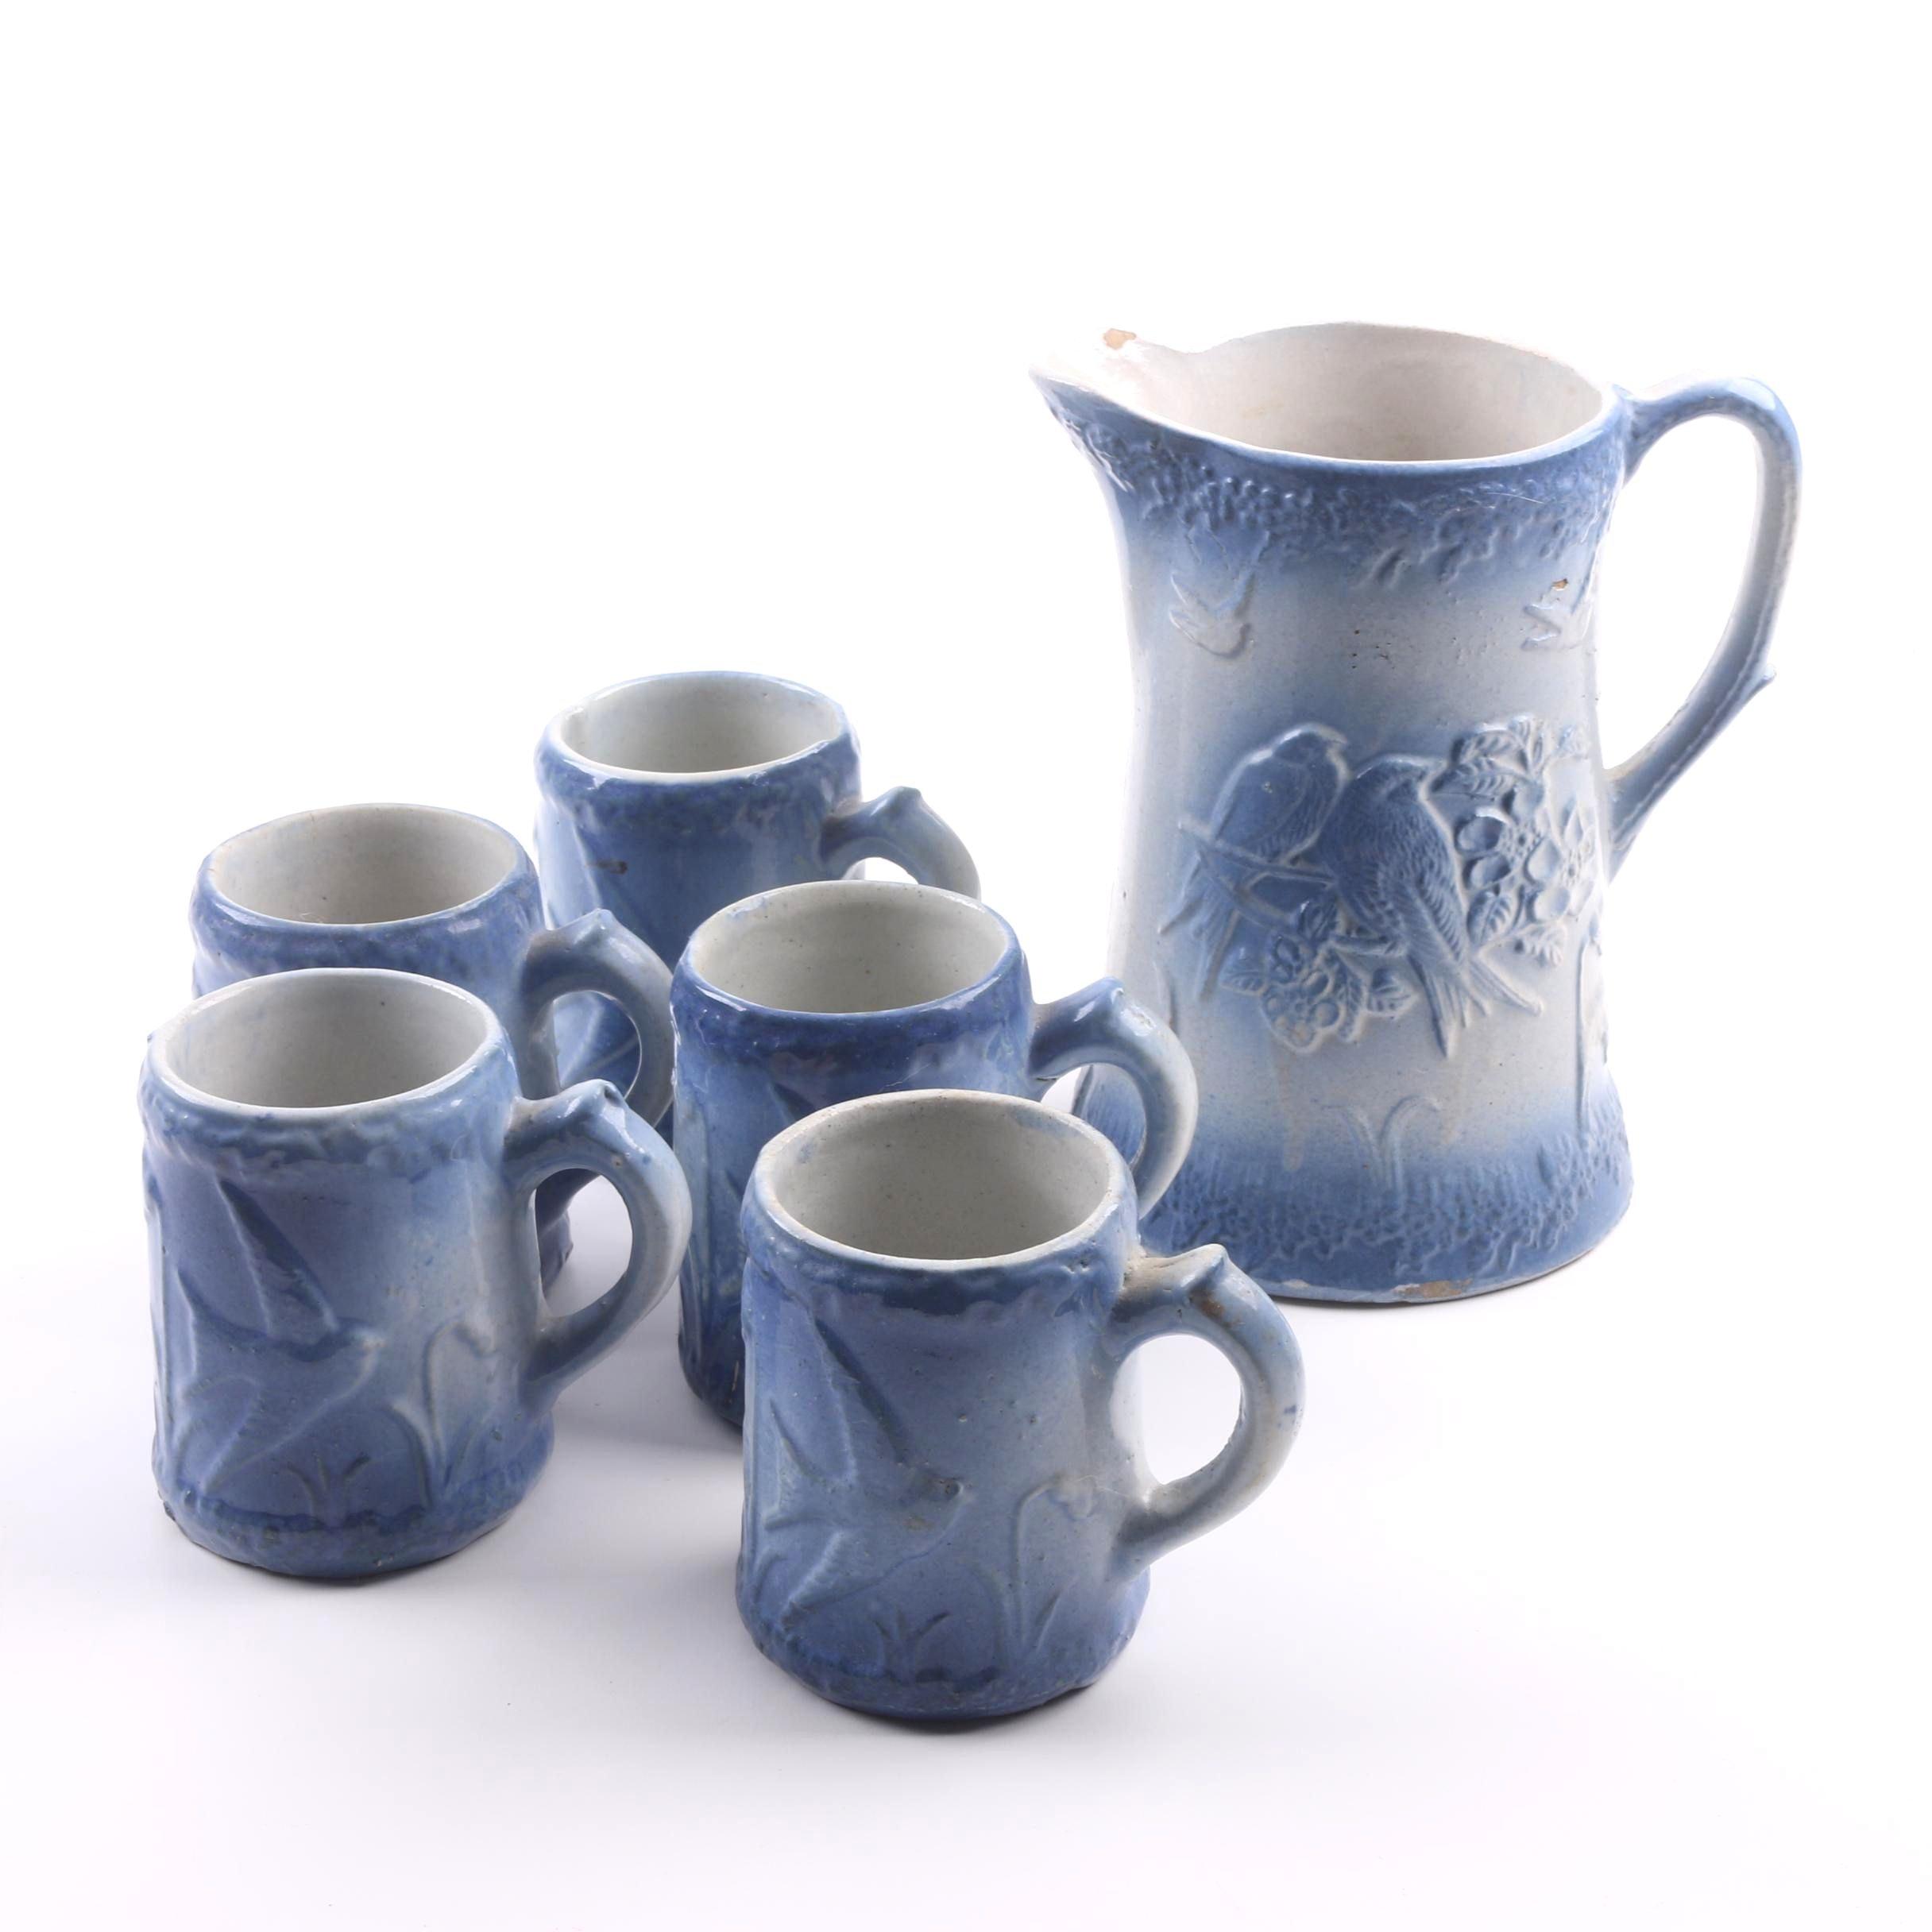 Vintage Blue Salt Glaze Stoneware Pitcher and Mugs with Bird and Floral Motif